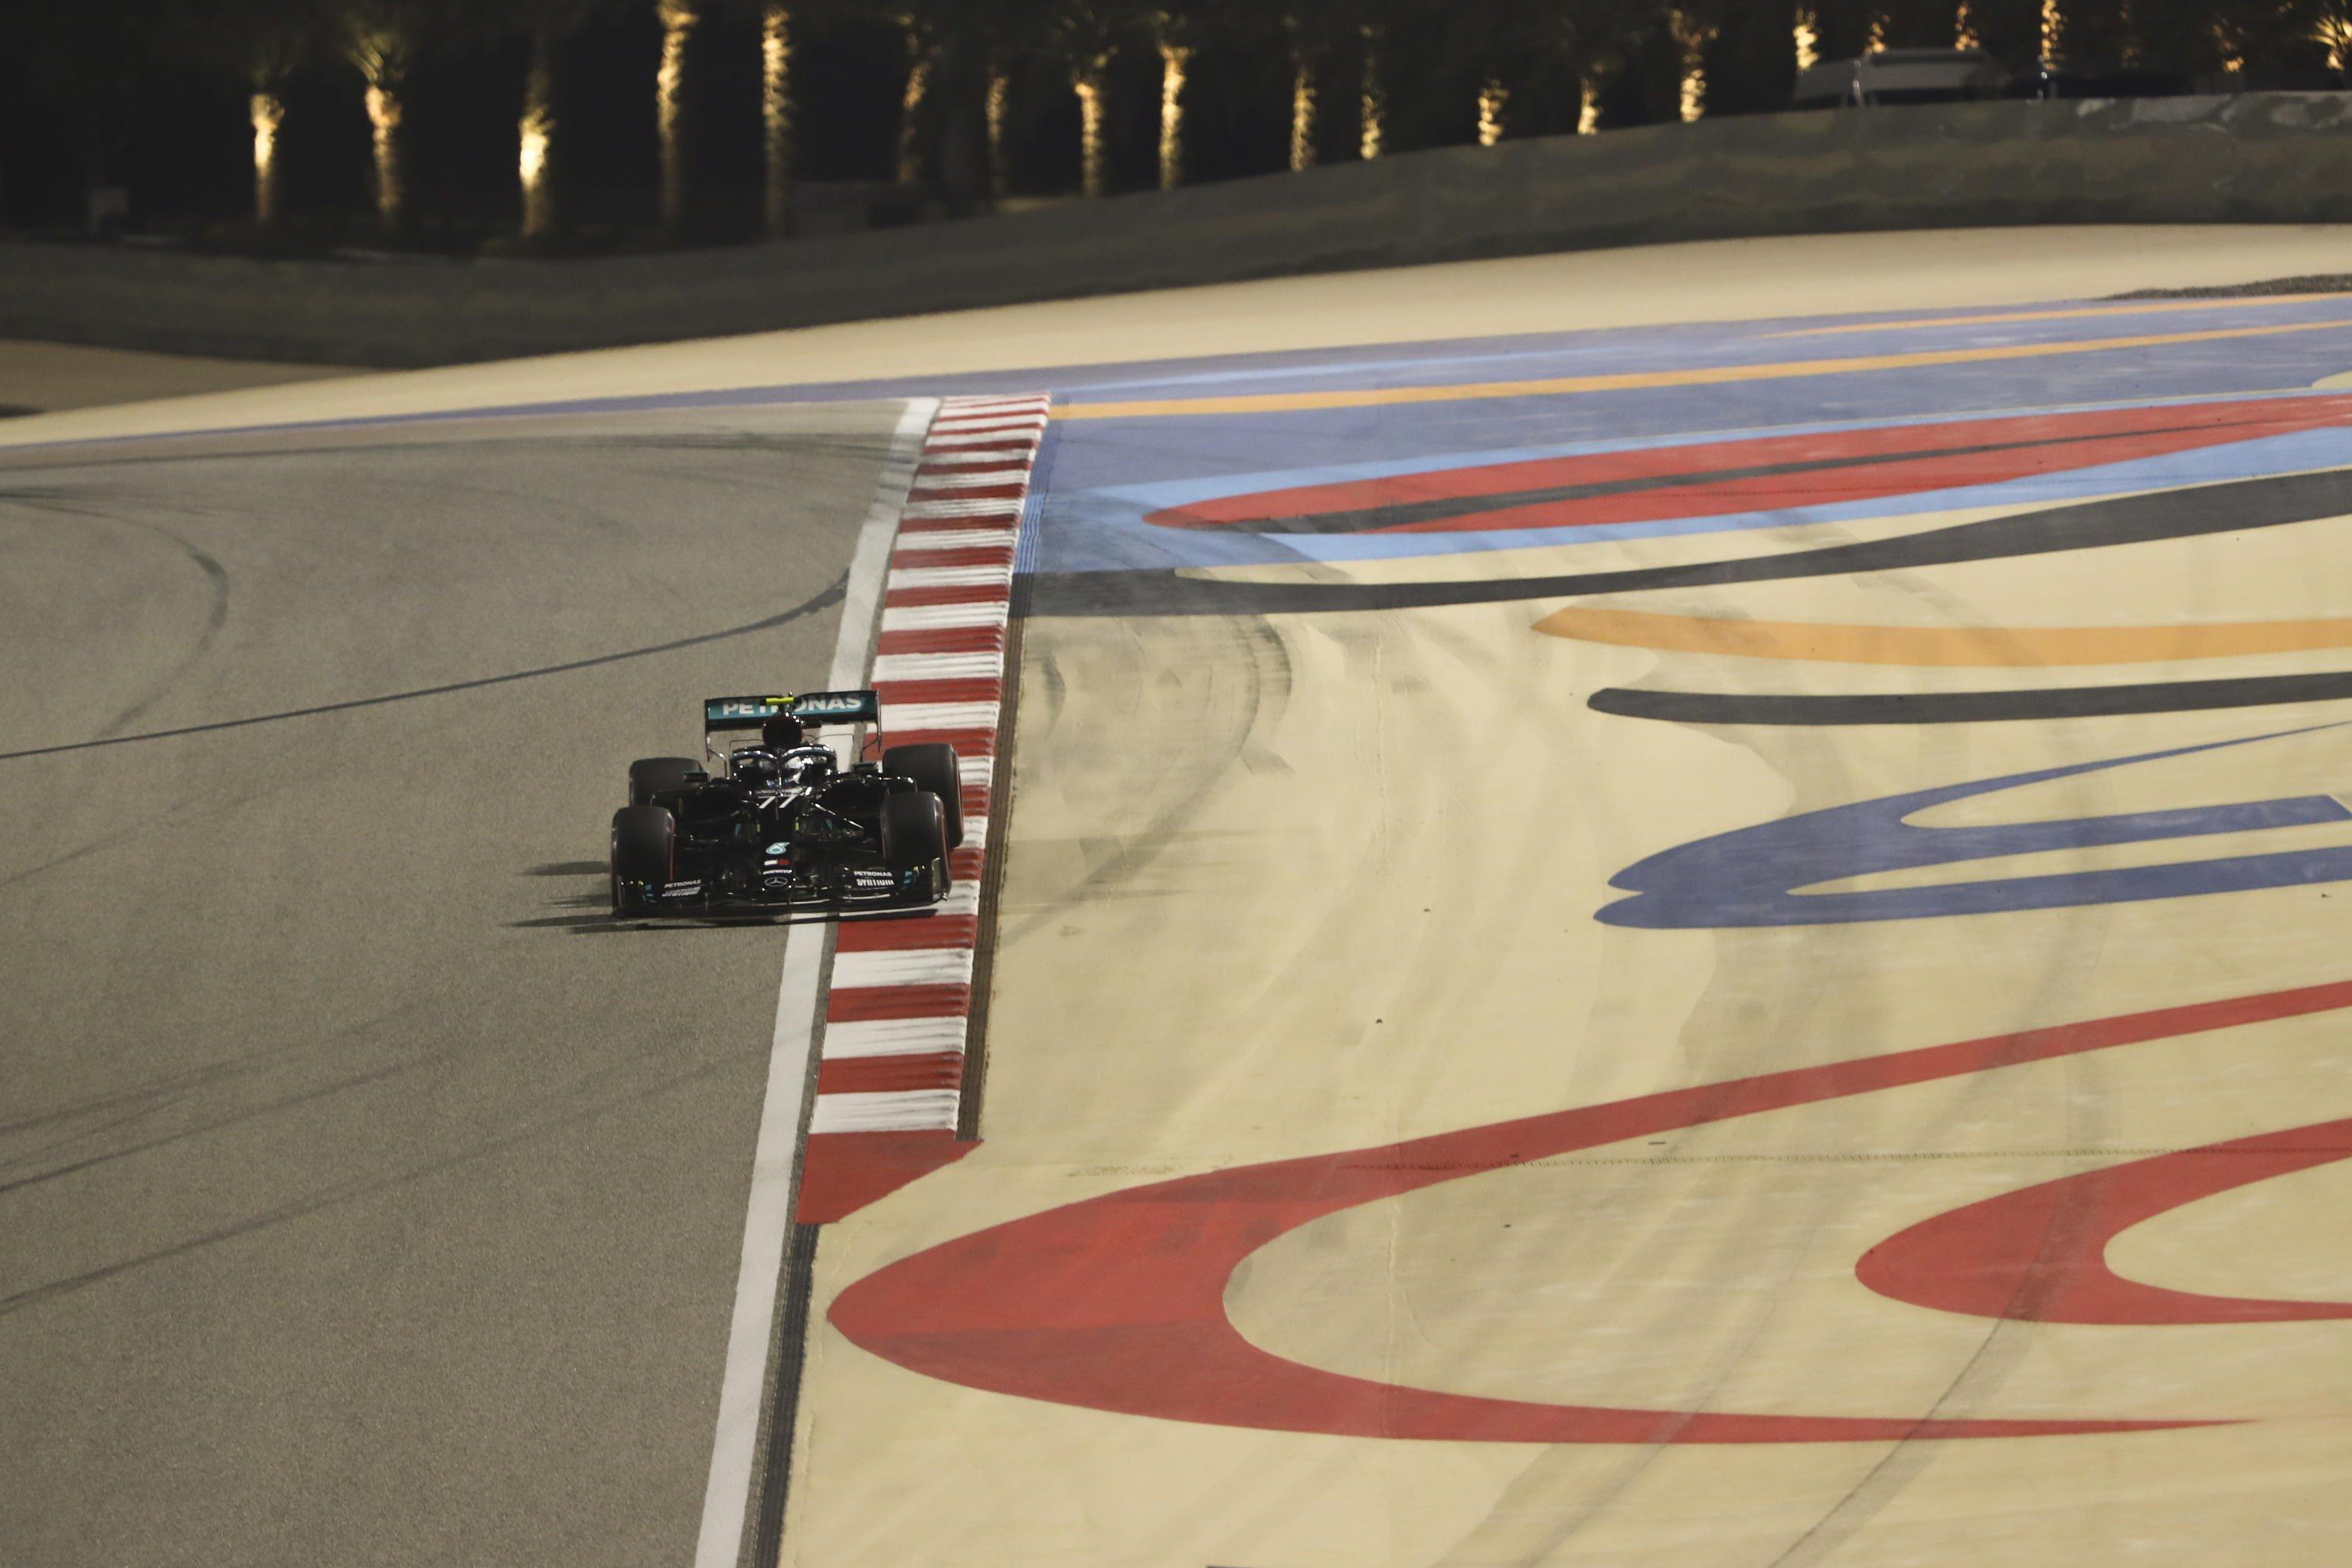 F1 Sakhir 2020, Gara, Diretta esclusiva ore 18:10 Sky Sport, Differita TV8